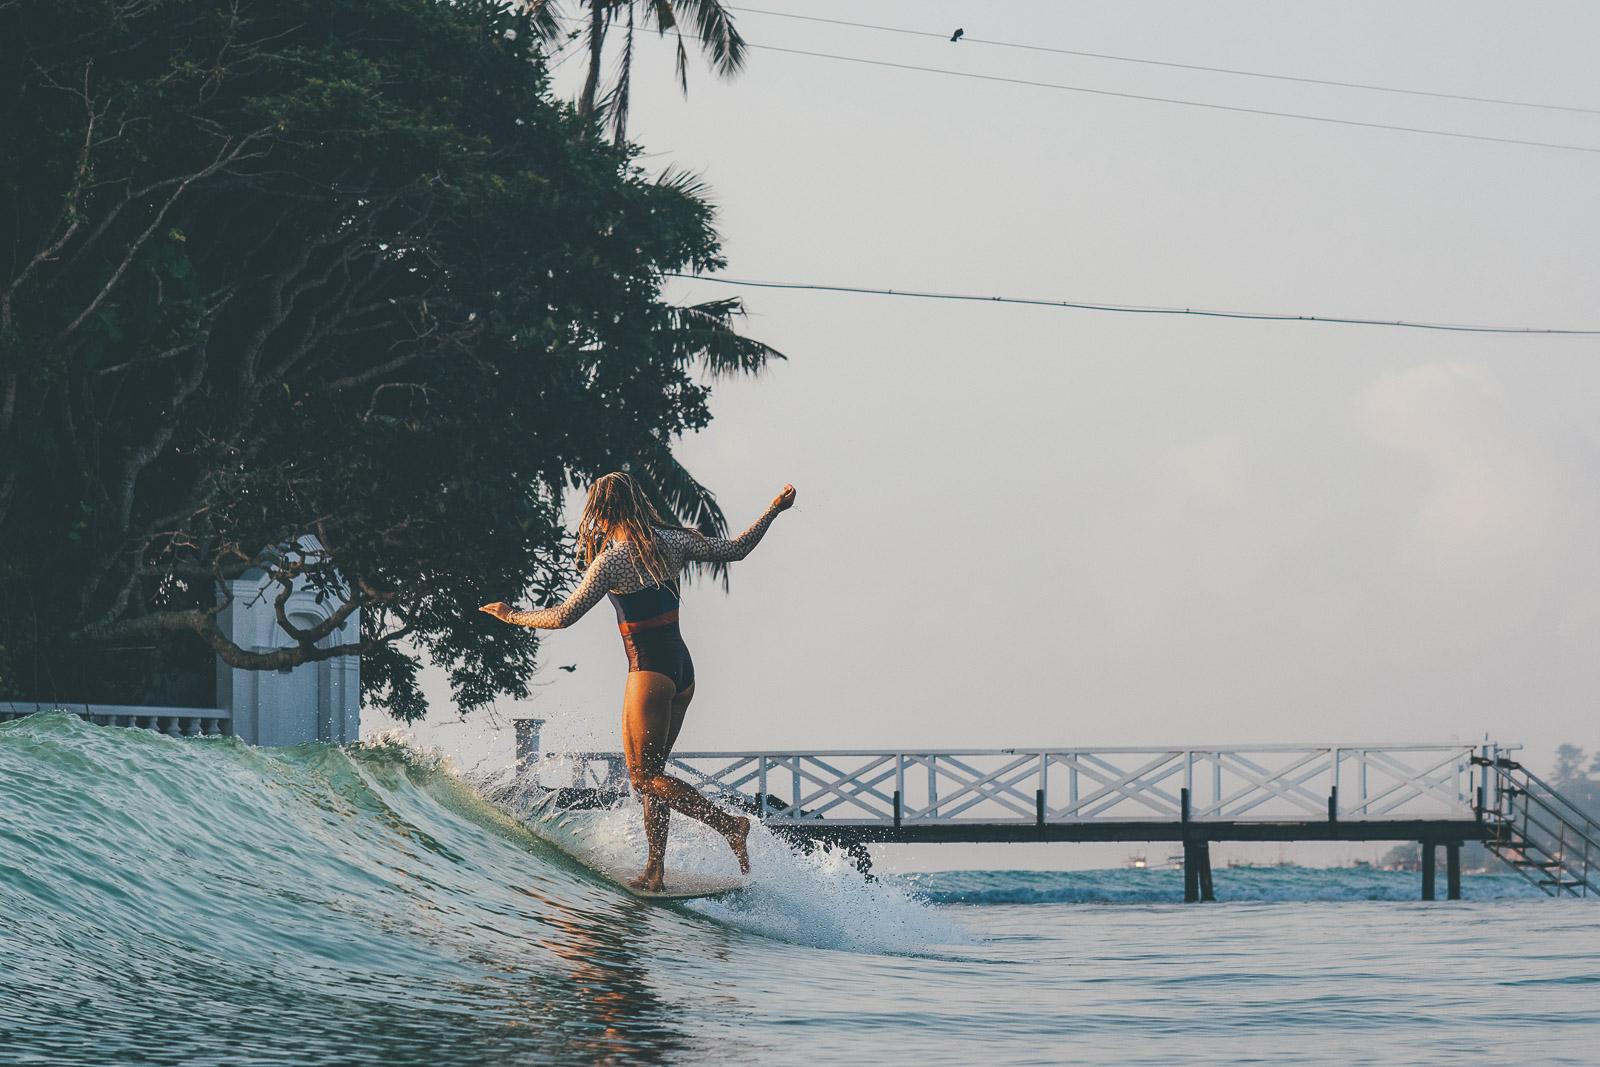 Karson Lewis surfing in Sri Lanka